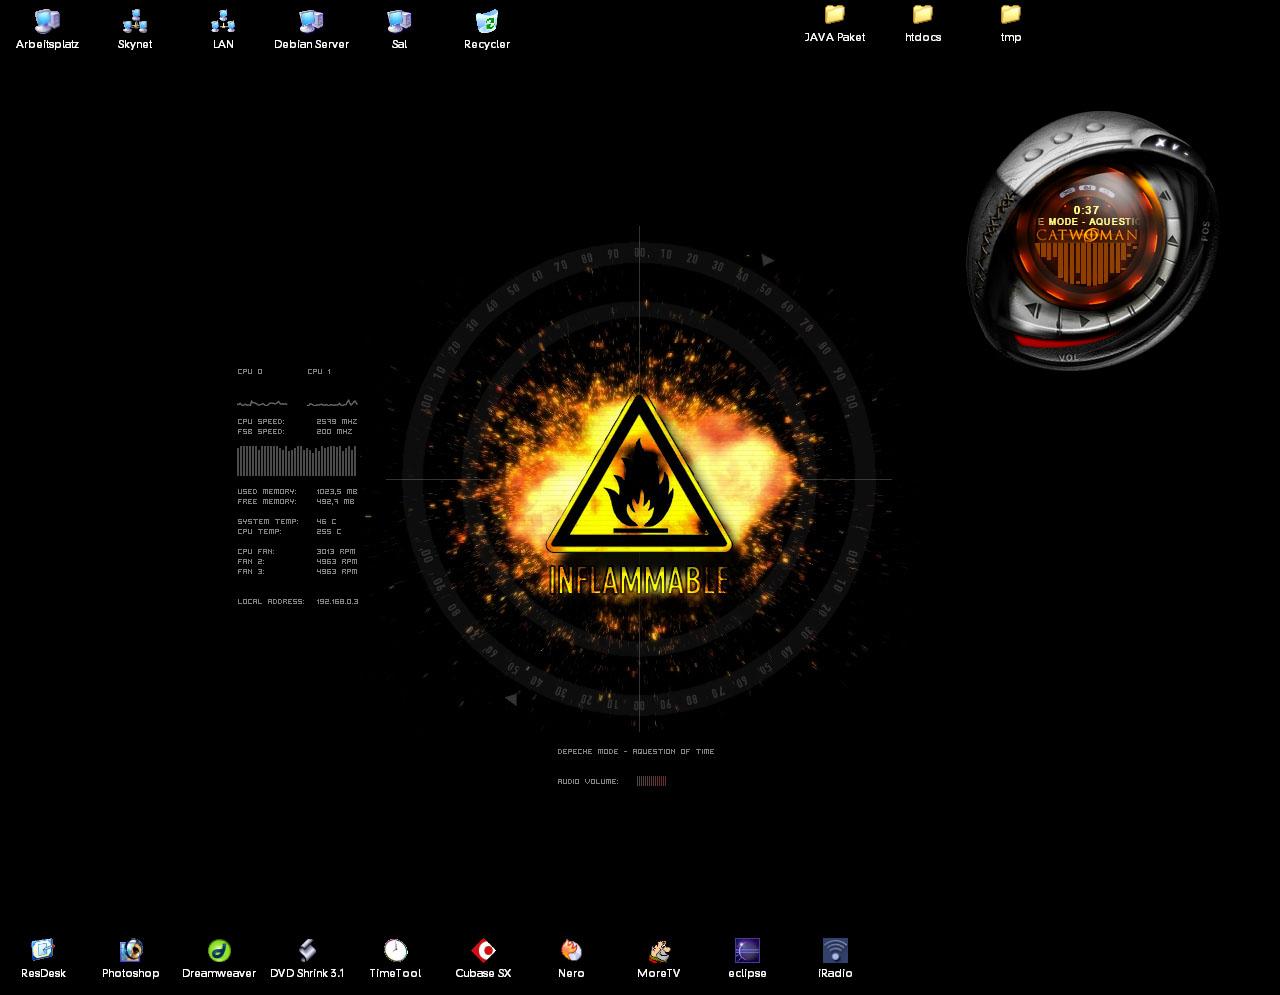 Title: My inflammable Desktop